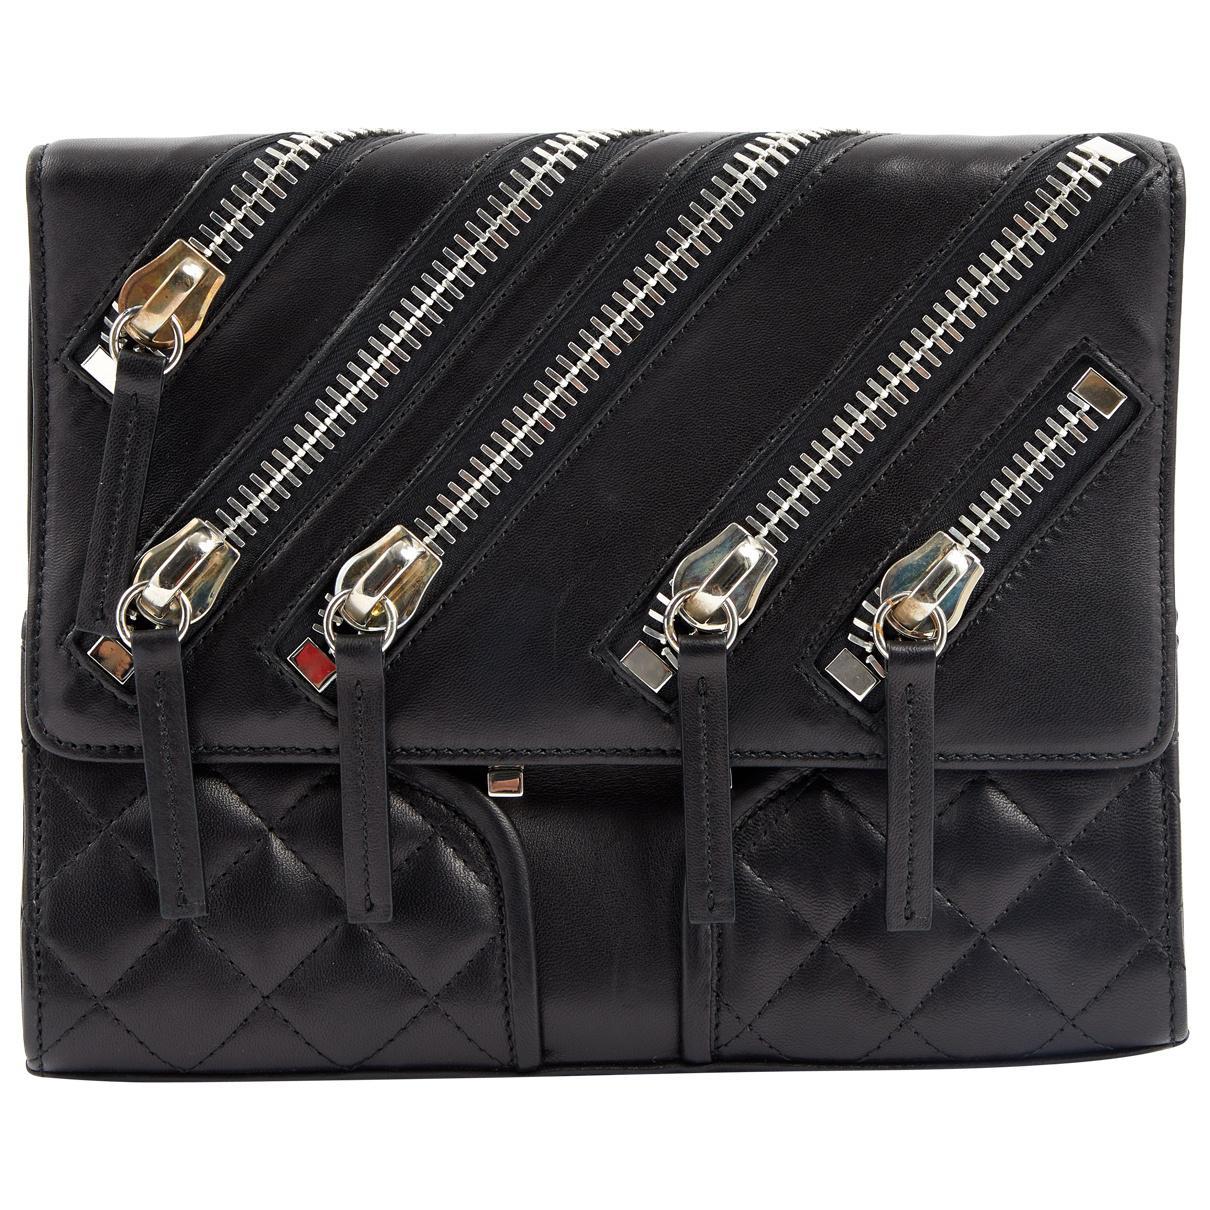 Pre-owned - Leather backpack Giuseppe Zanotti 9aZQxK4